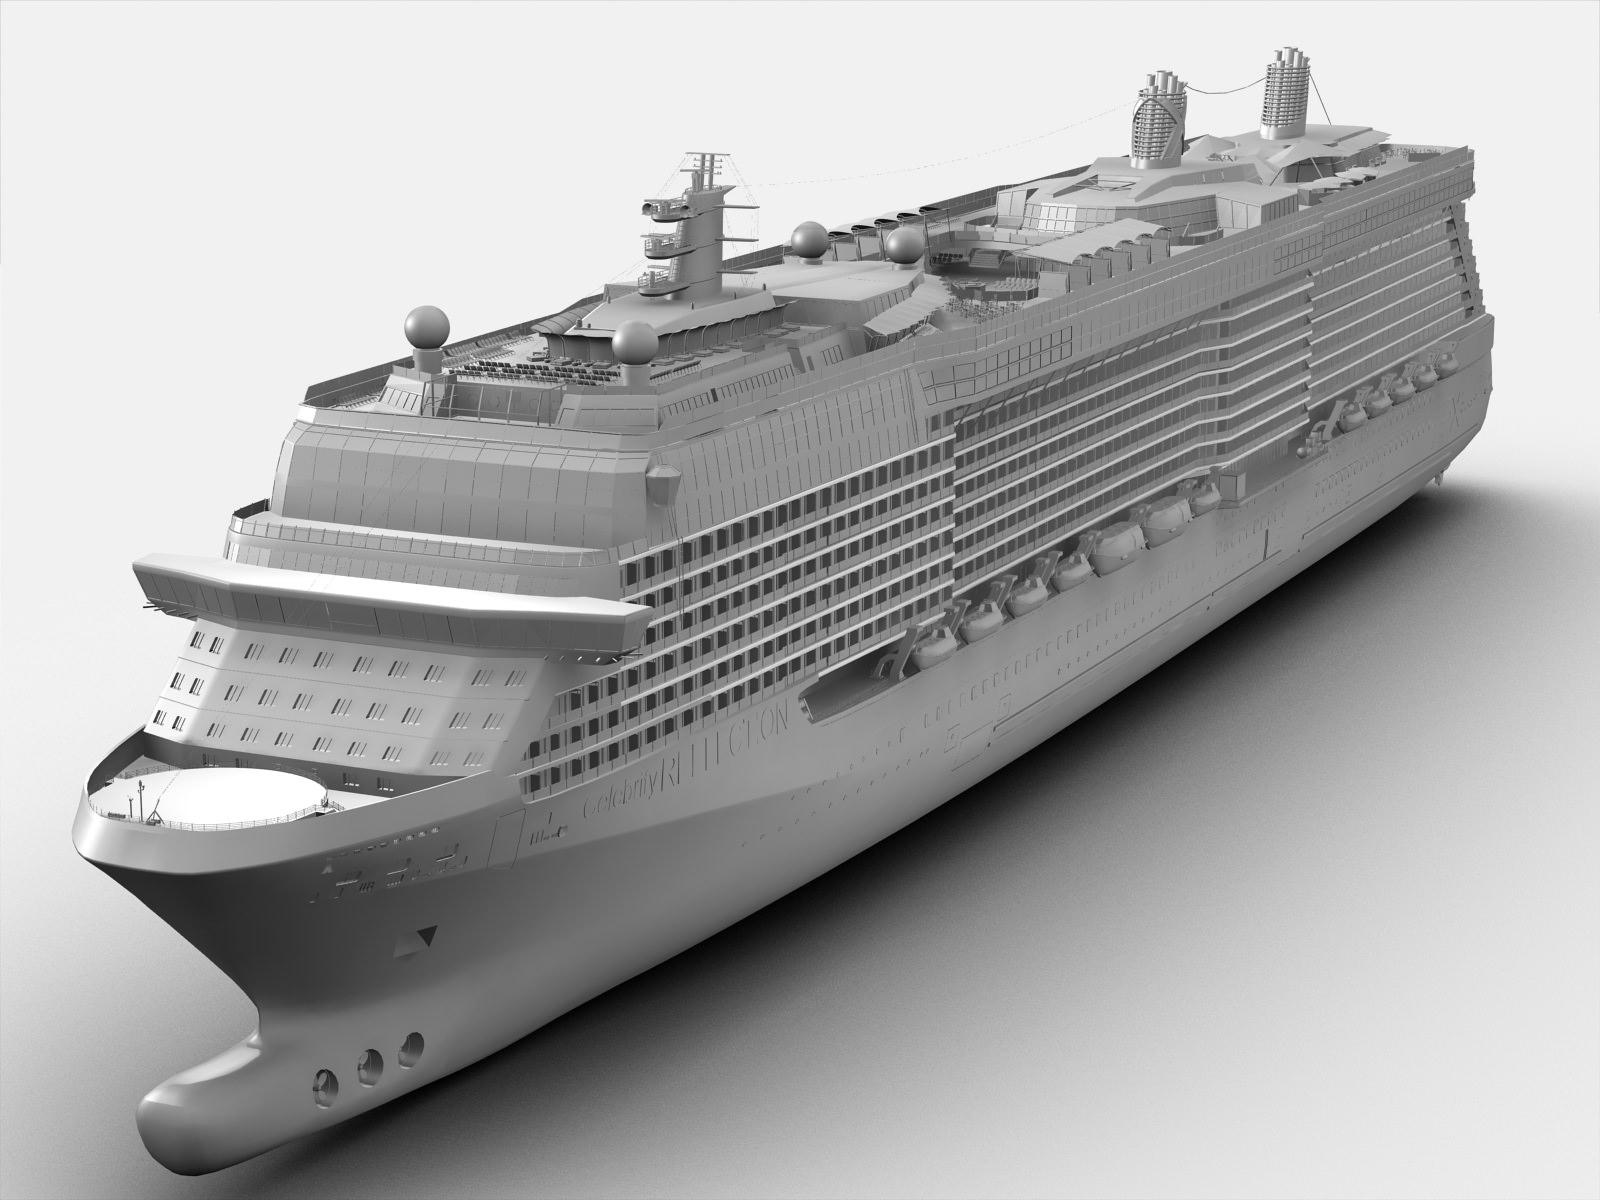 Celebrity Reflection Cruise Ship 3d Model Max Obj Fbx Ma